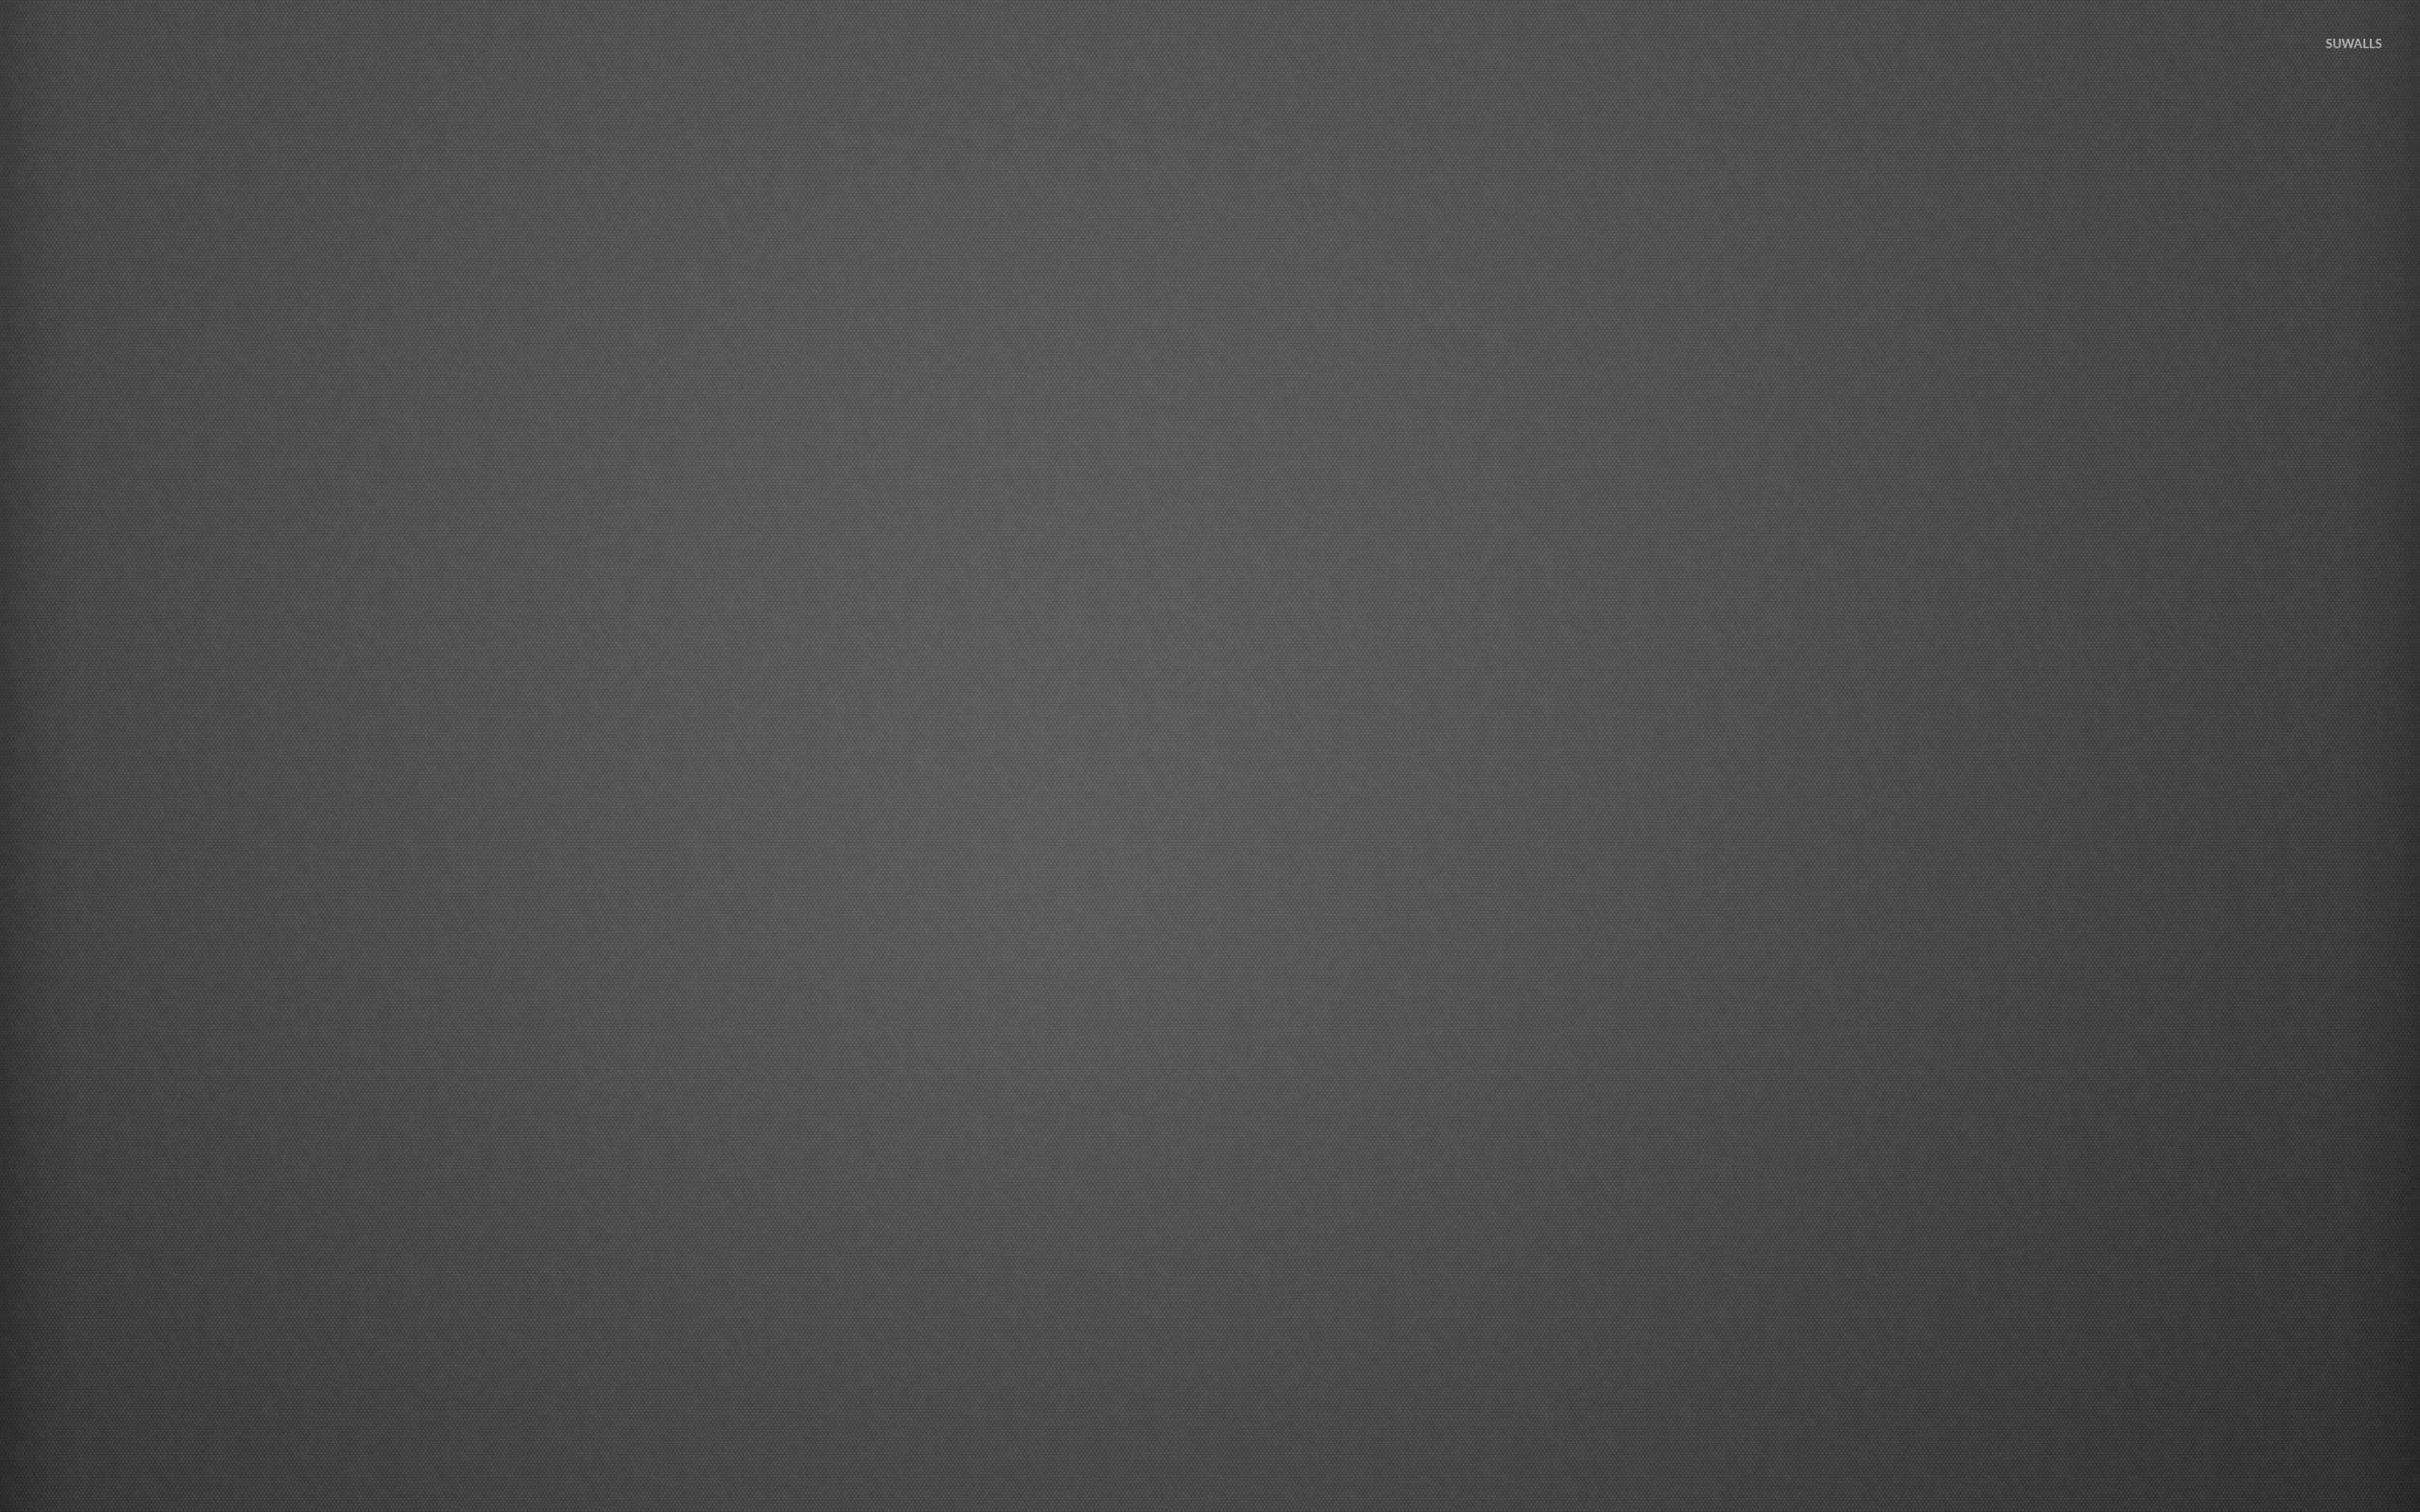 Gray Abstract Wallpaper (86 Wallpapers) - HD Wallpapers